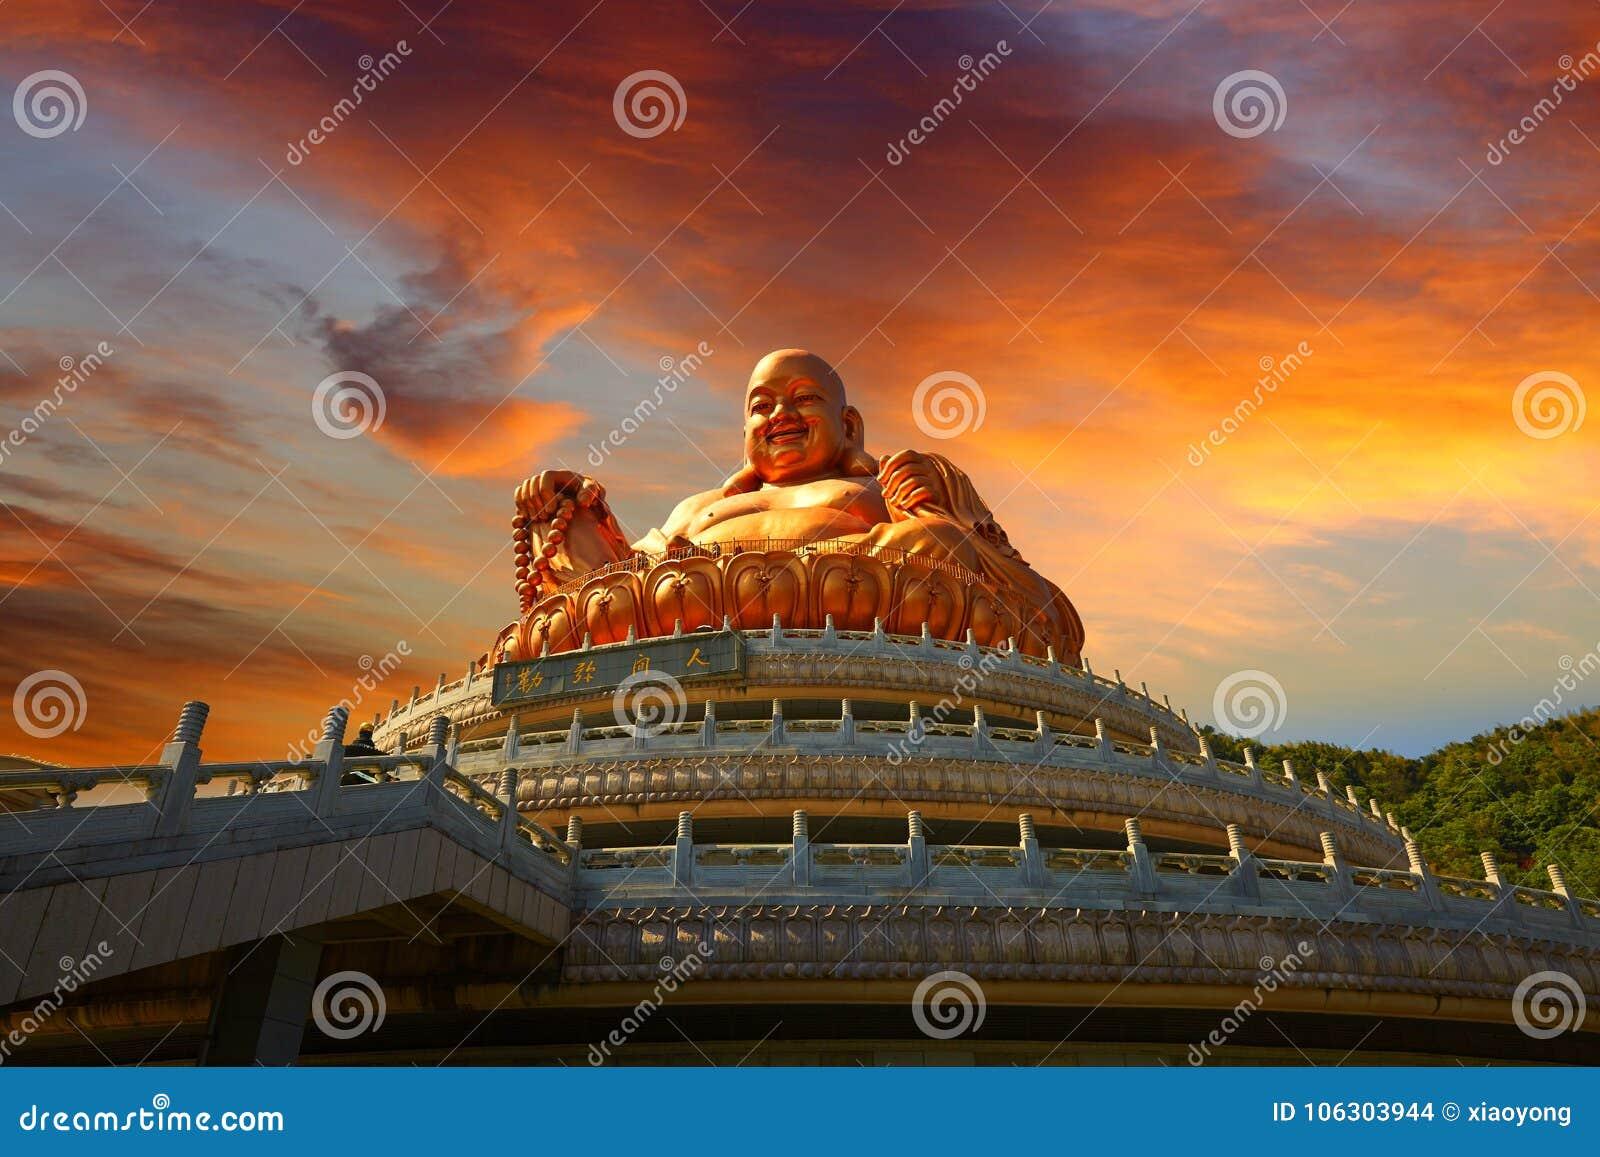 China, Ningbo, Mile Buddha Statue